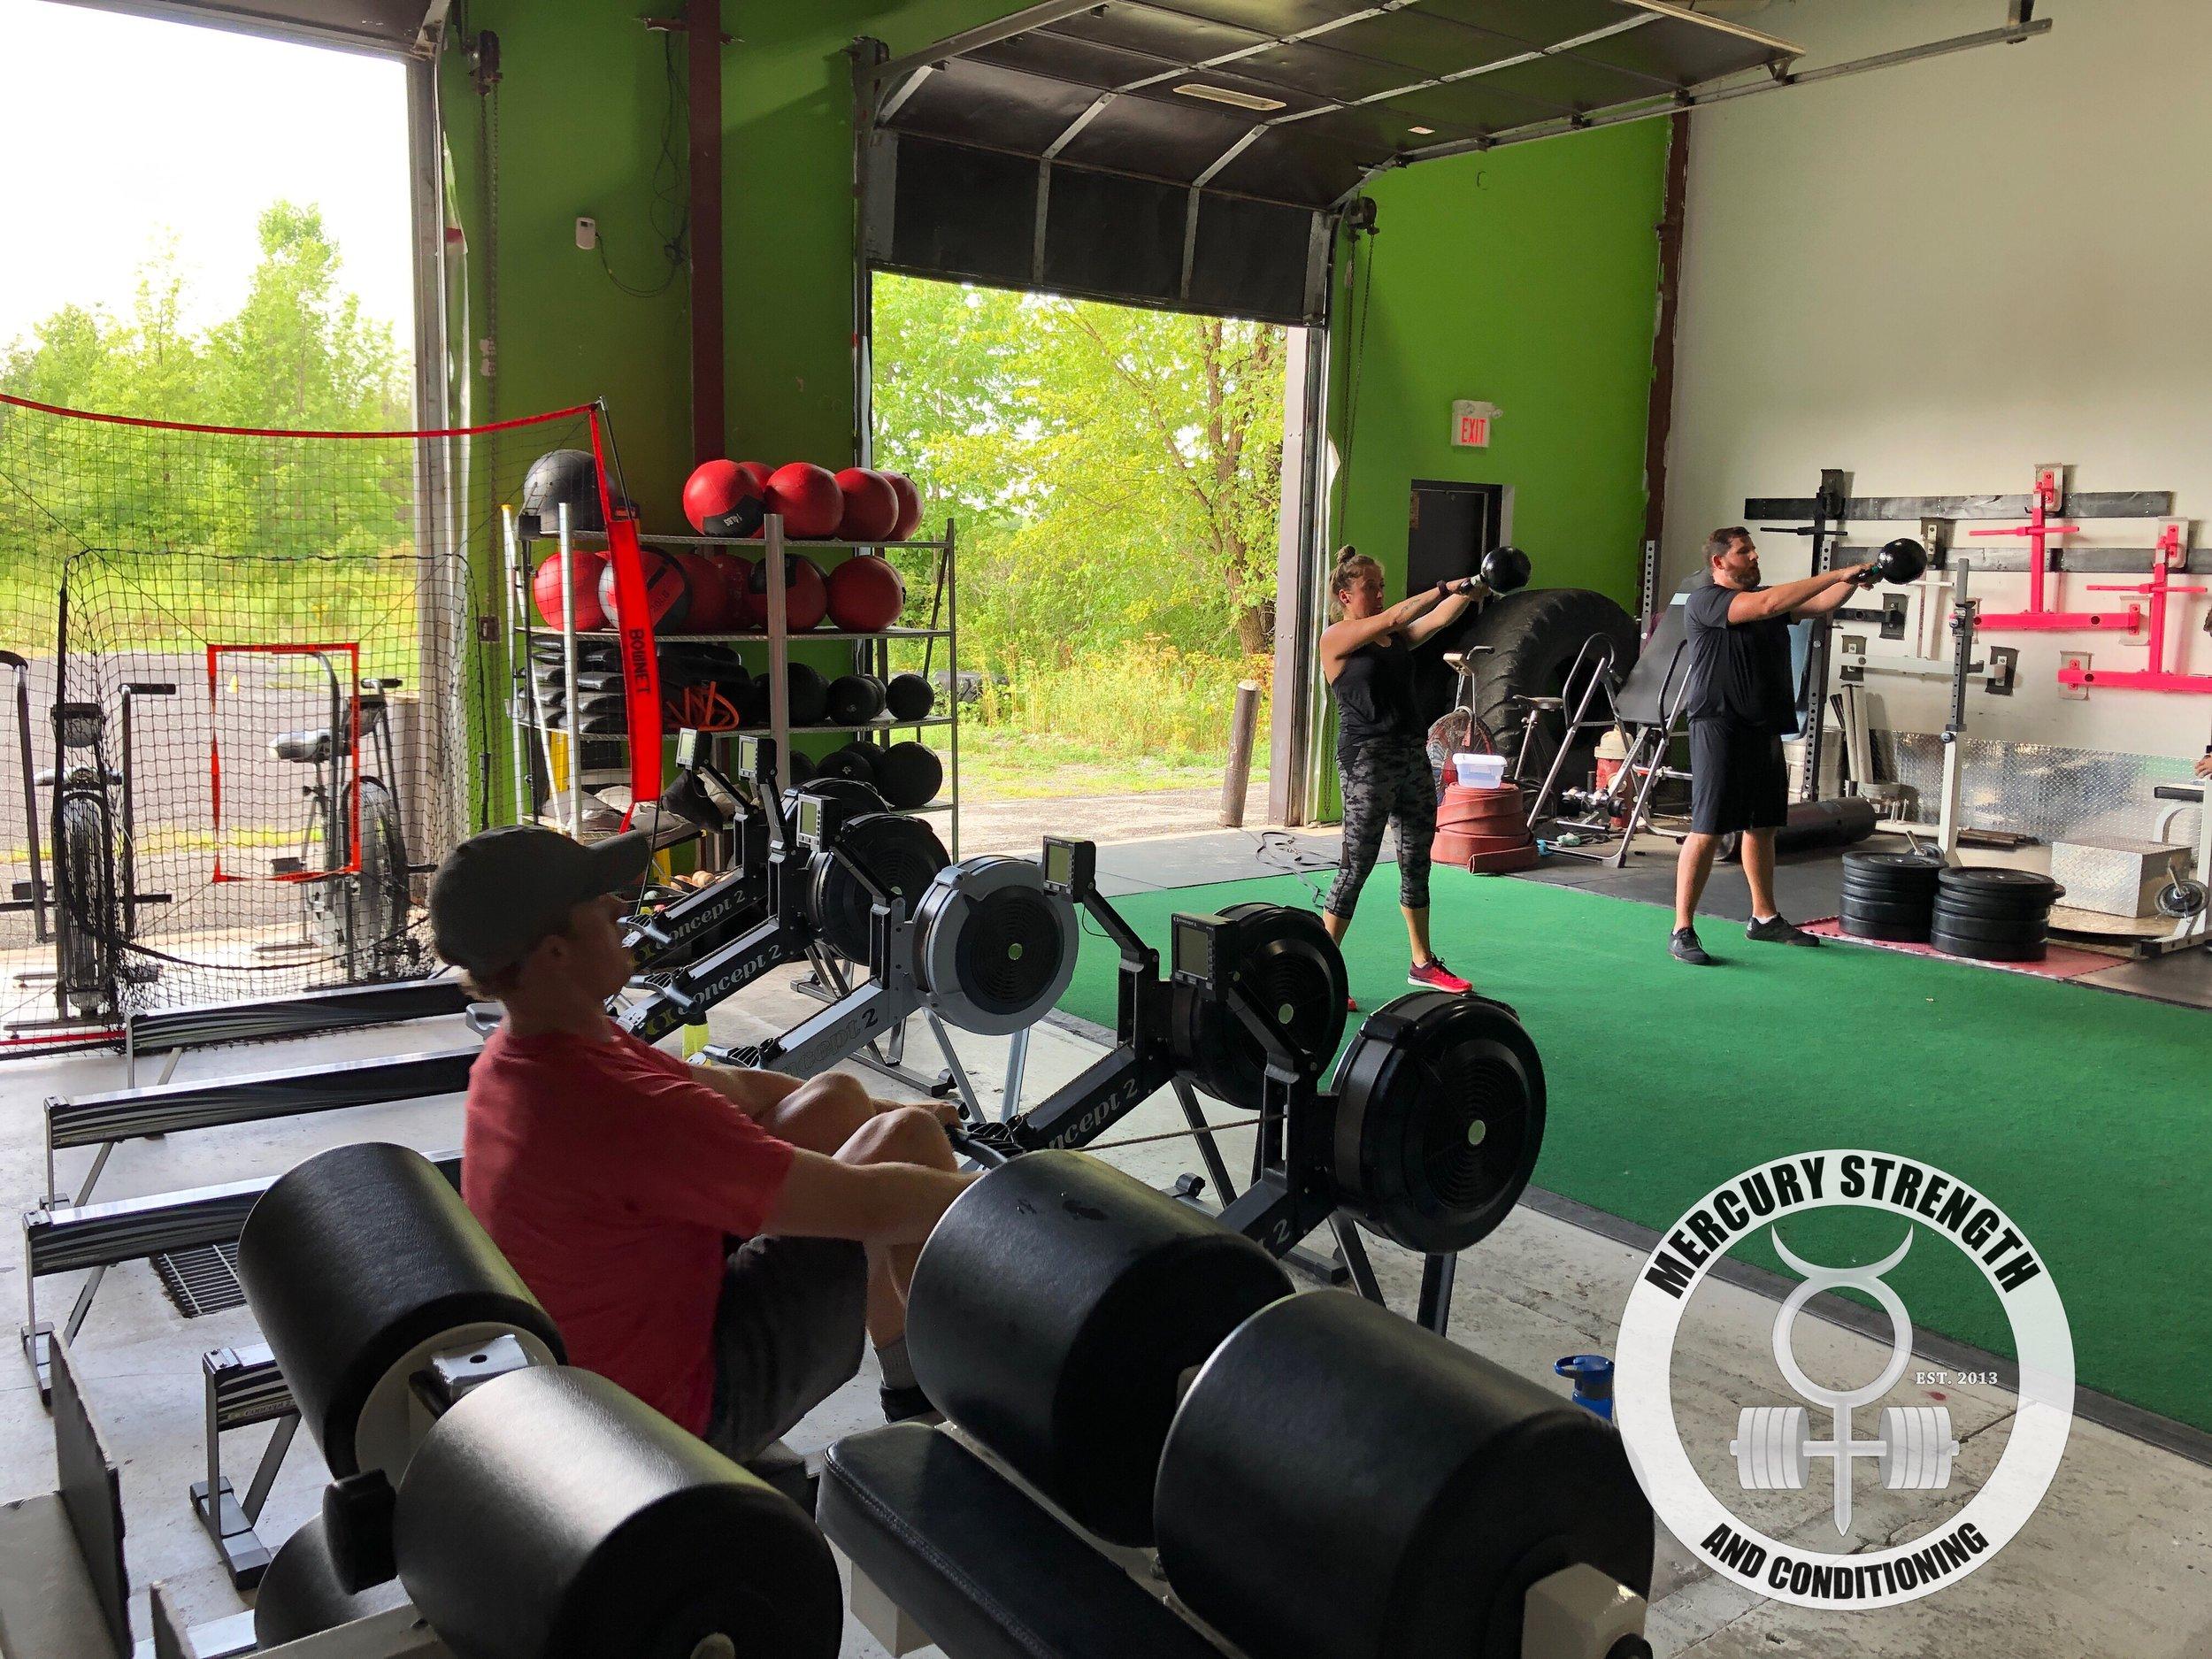 Gym-powerlifting-fitness-personal training-training-bootcamp-crossfit-kingston-kingston gym-kids-mercury-strength-conditioning-athlete-Row-KB Swing